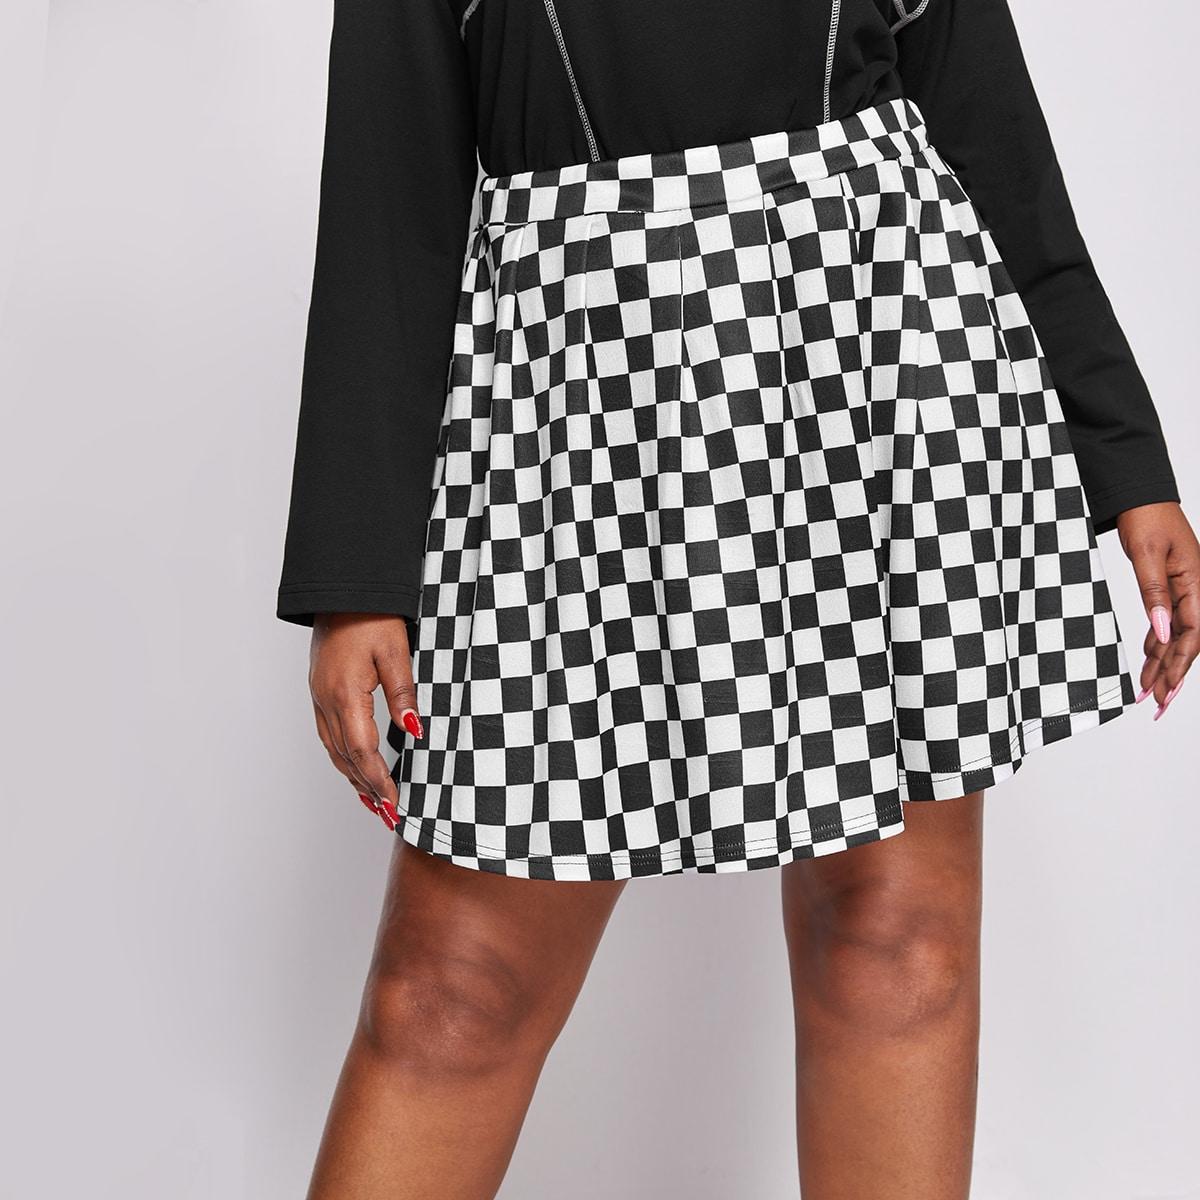 SHEIN / Plus Checker Plaid Pleated Skirt